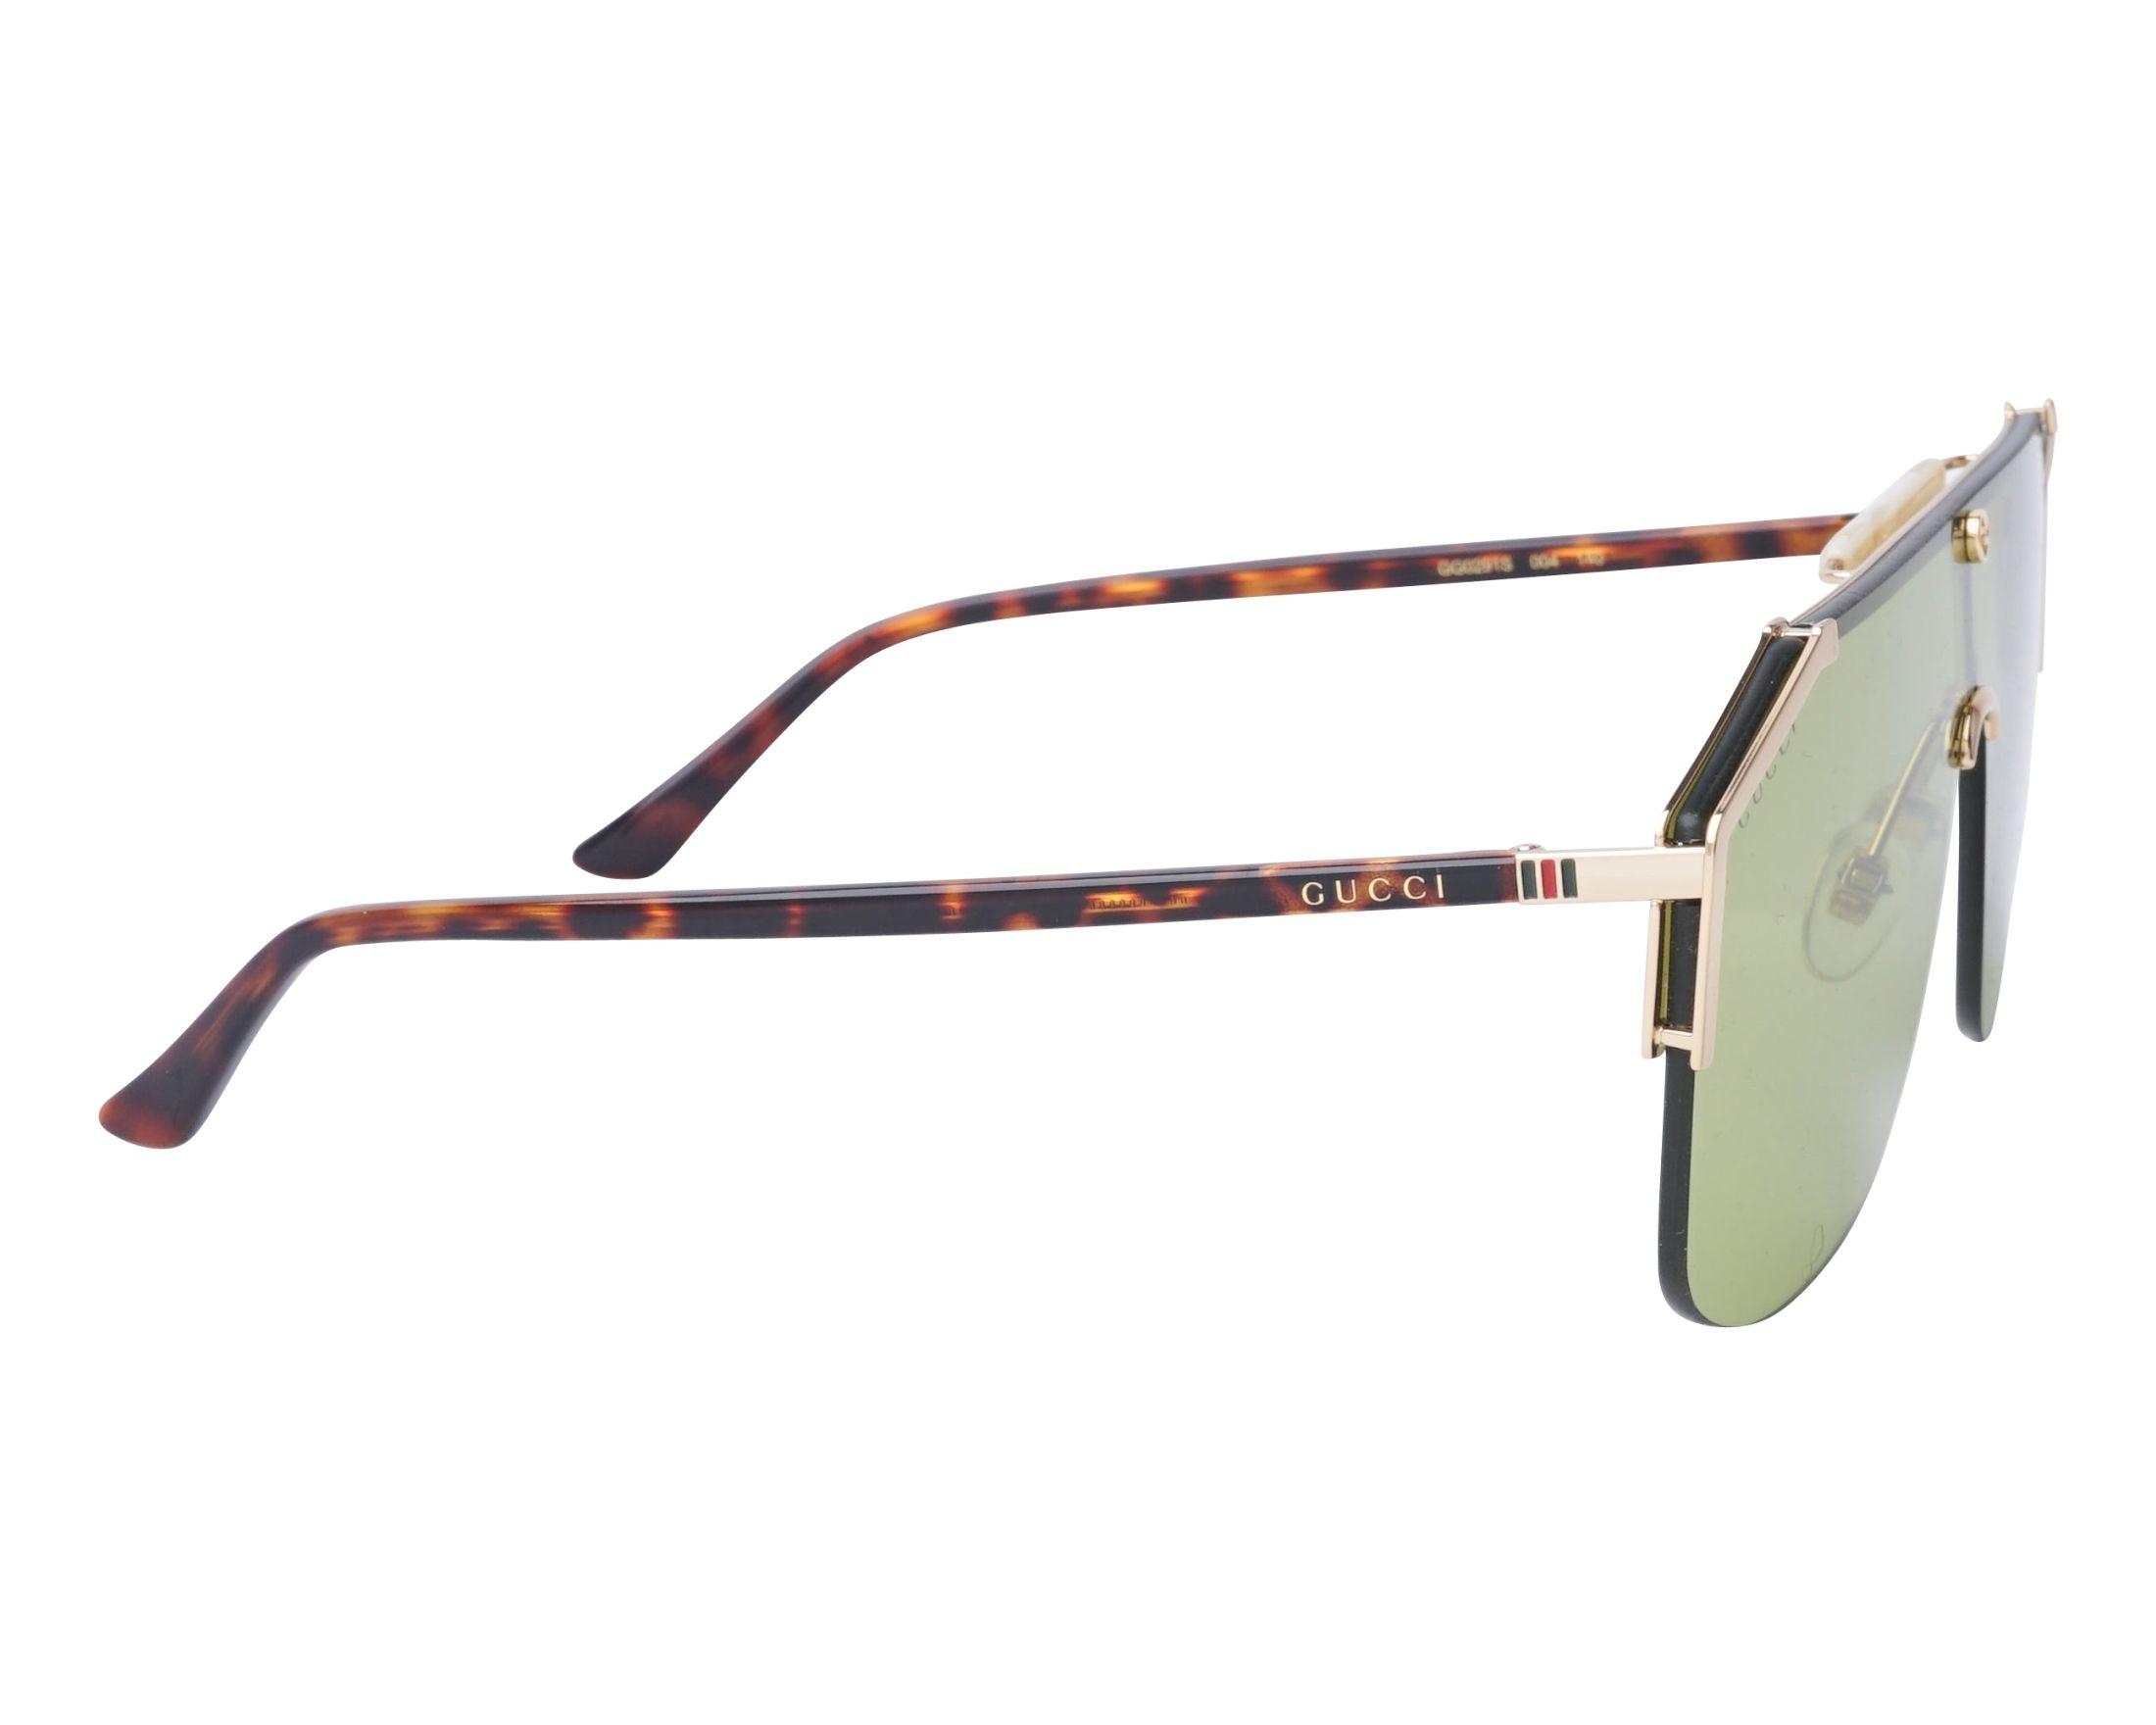 54f817cd433 Sunglasses Gucci GG-0291-S 004 99-1 Gold Havana side view